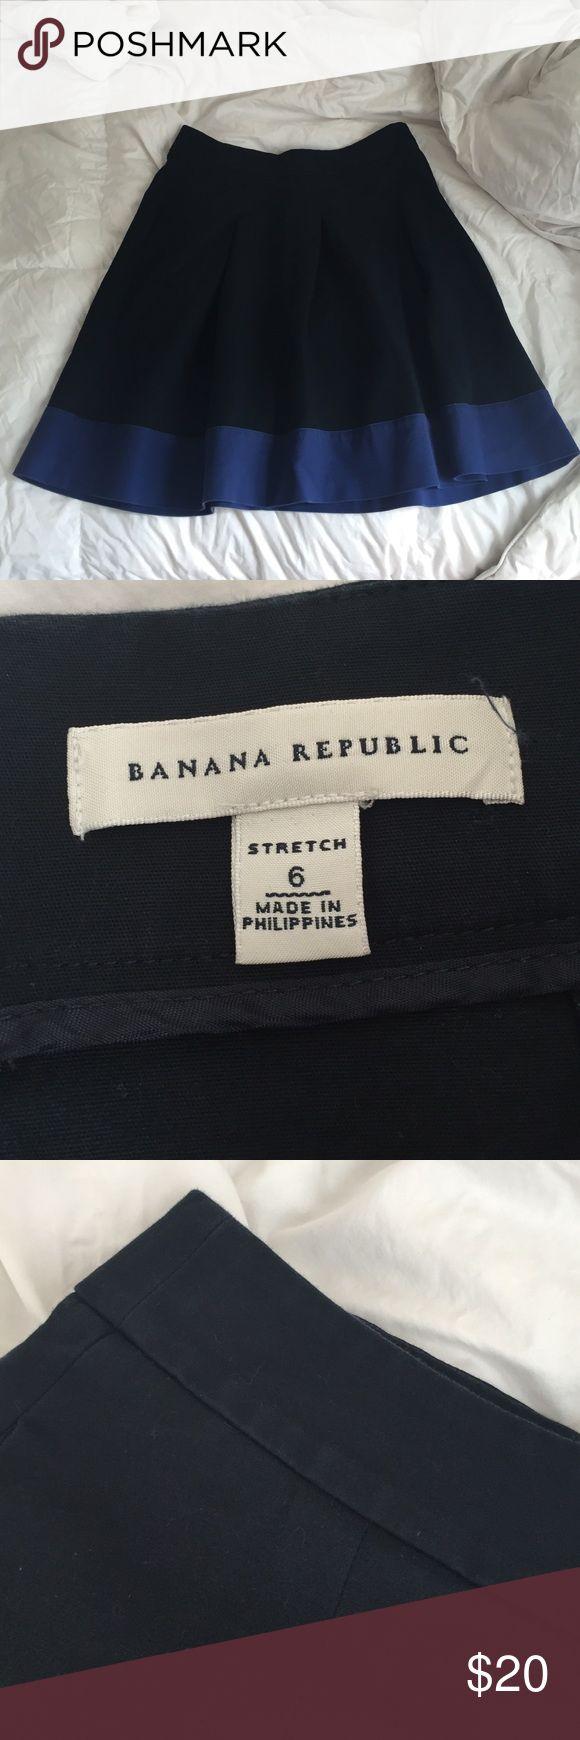 "Banana Republic skirt Banana Republic skirt. Size 6, 20"" long. Zip, and hook closure in back. Cotton/spandex. Slight fading at waistline, but not obvious. Banana Republic Skirts"